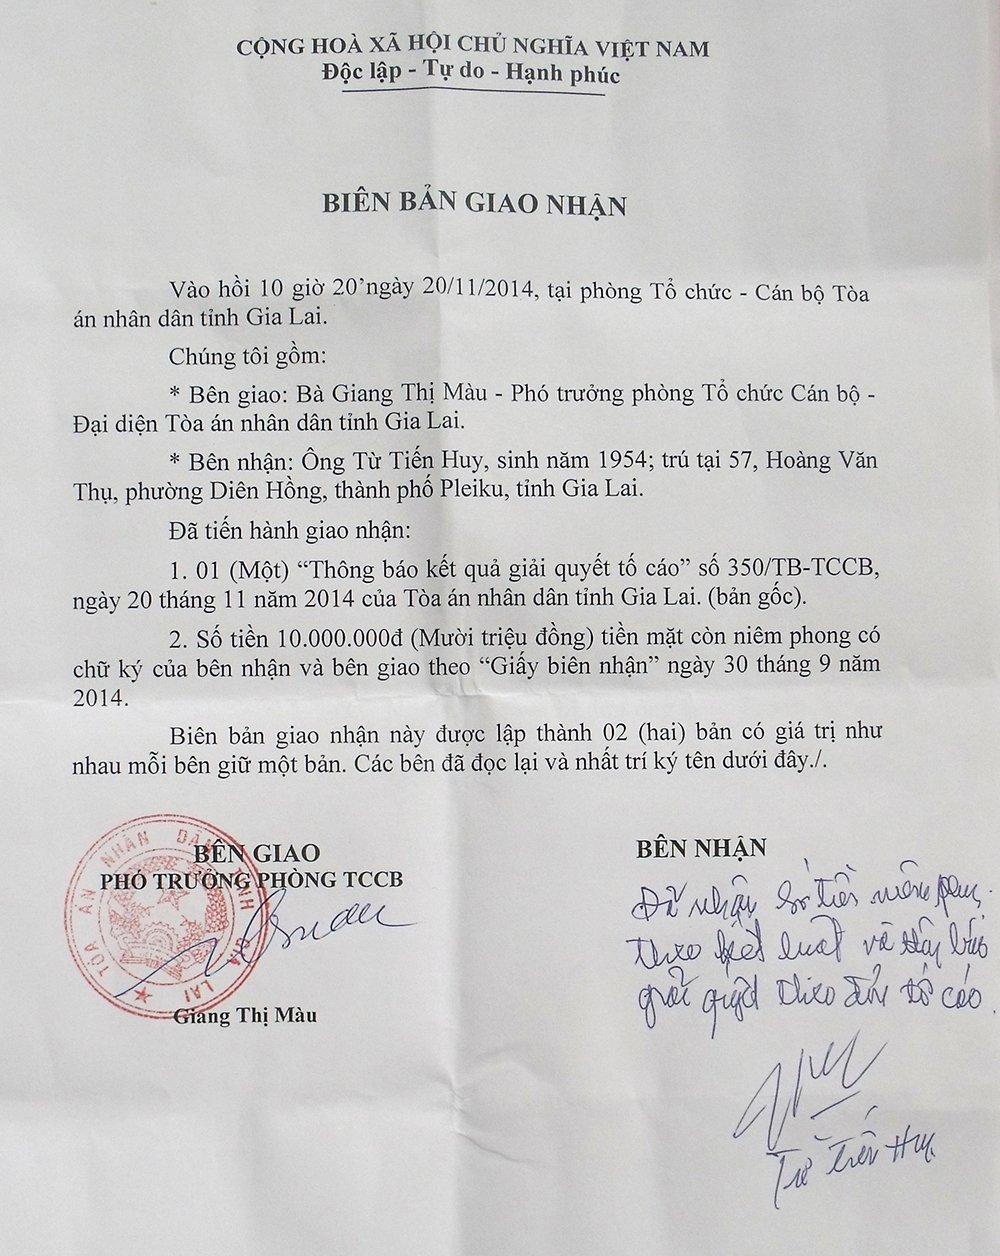 Vu an danh lon gay thuong tich o Gia Lai: Duong su de nghi thay tham phan tung nhan hoi lo hinh anh 3